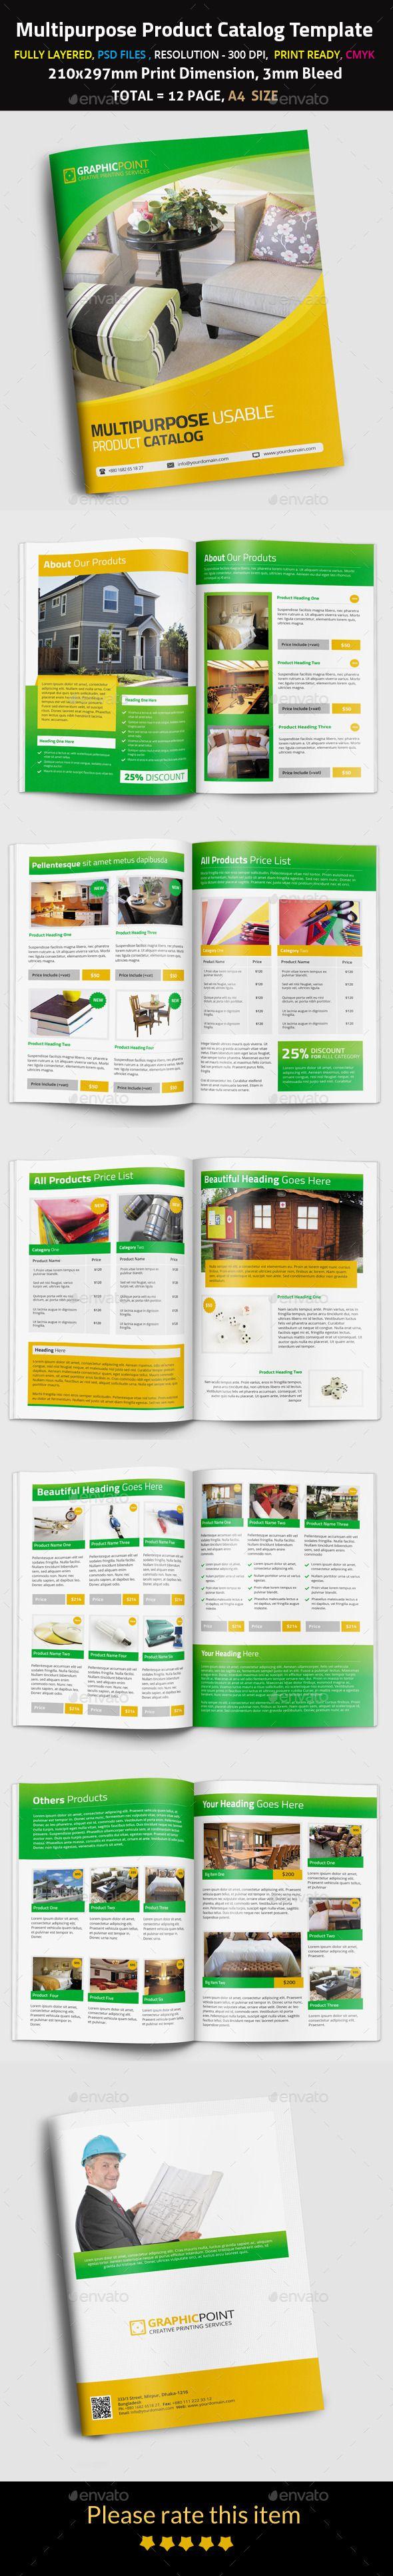 website catalog template